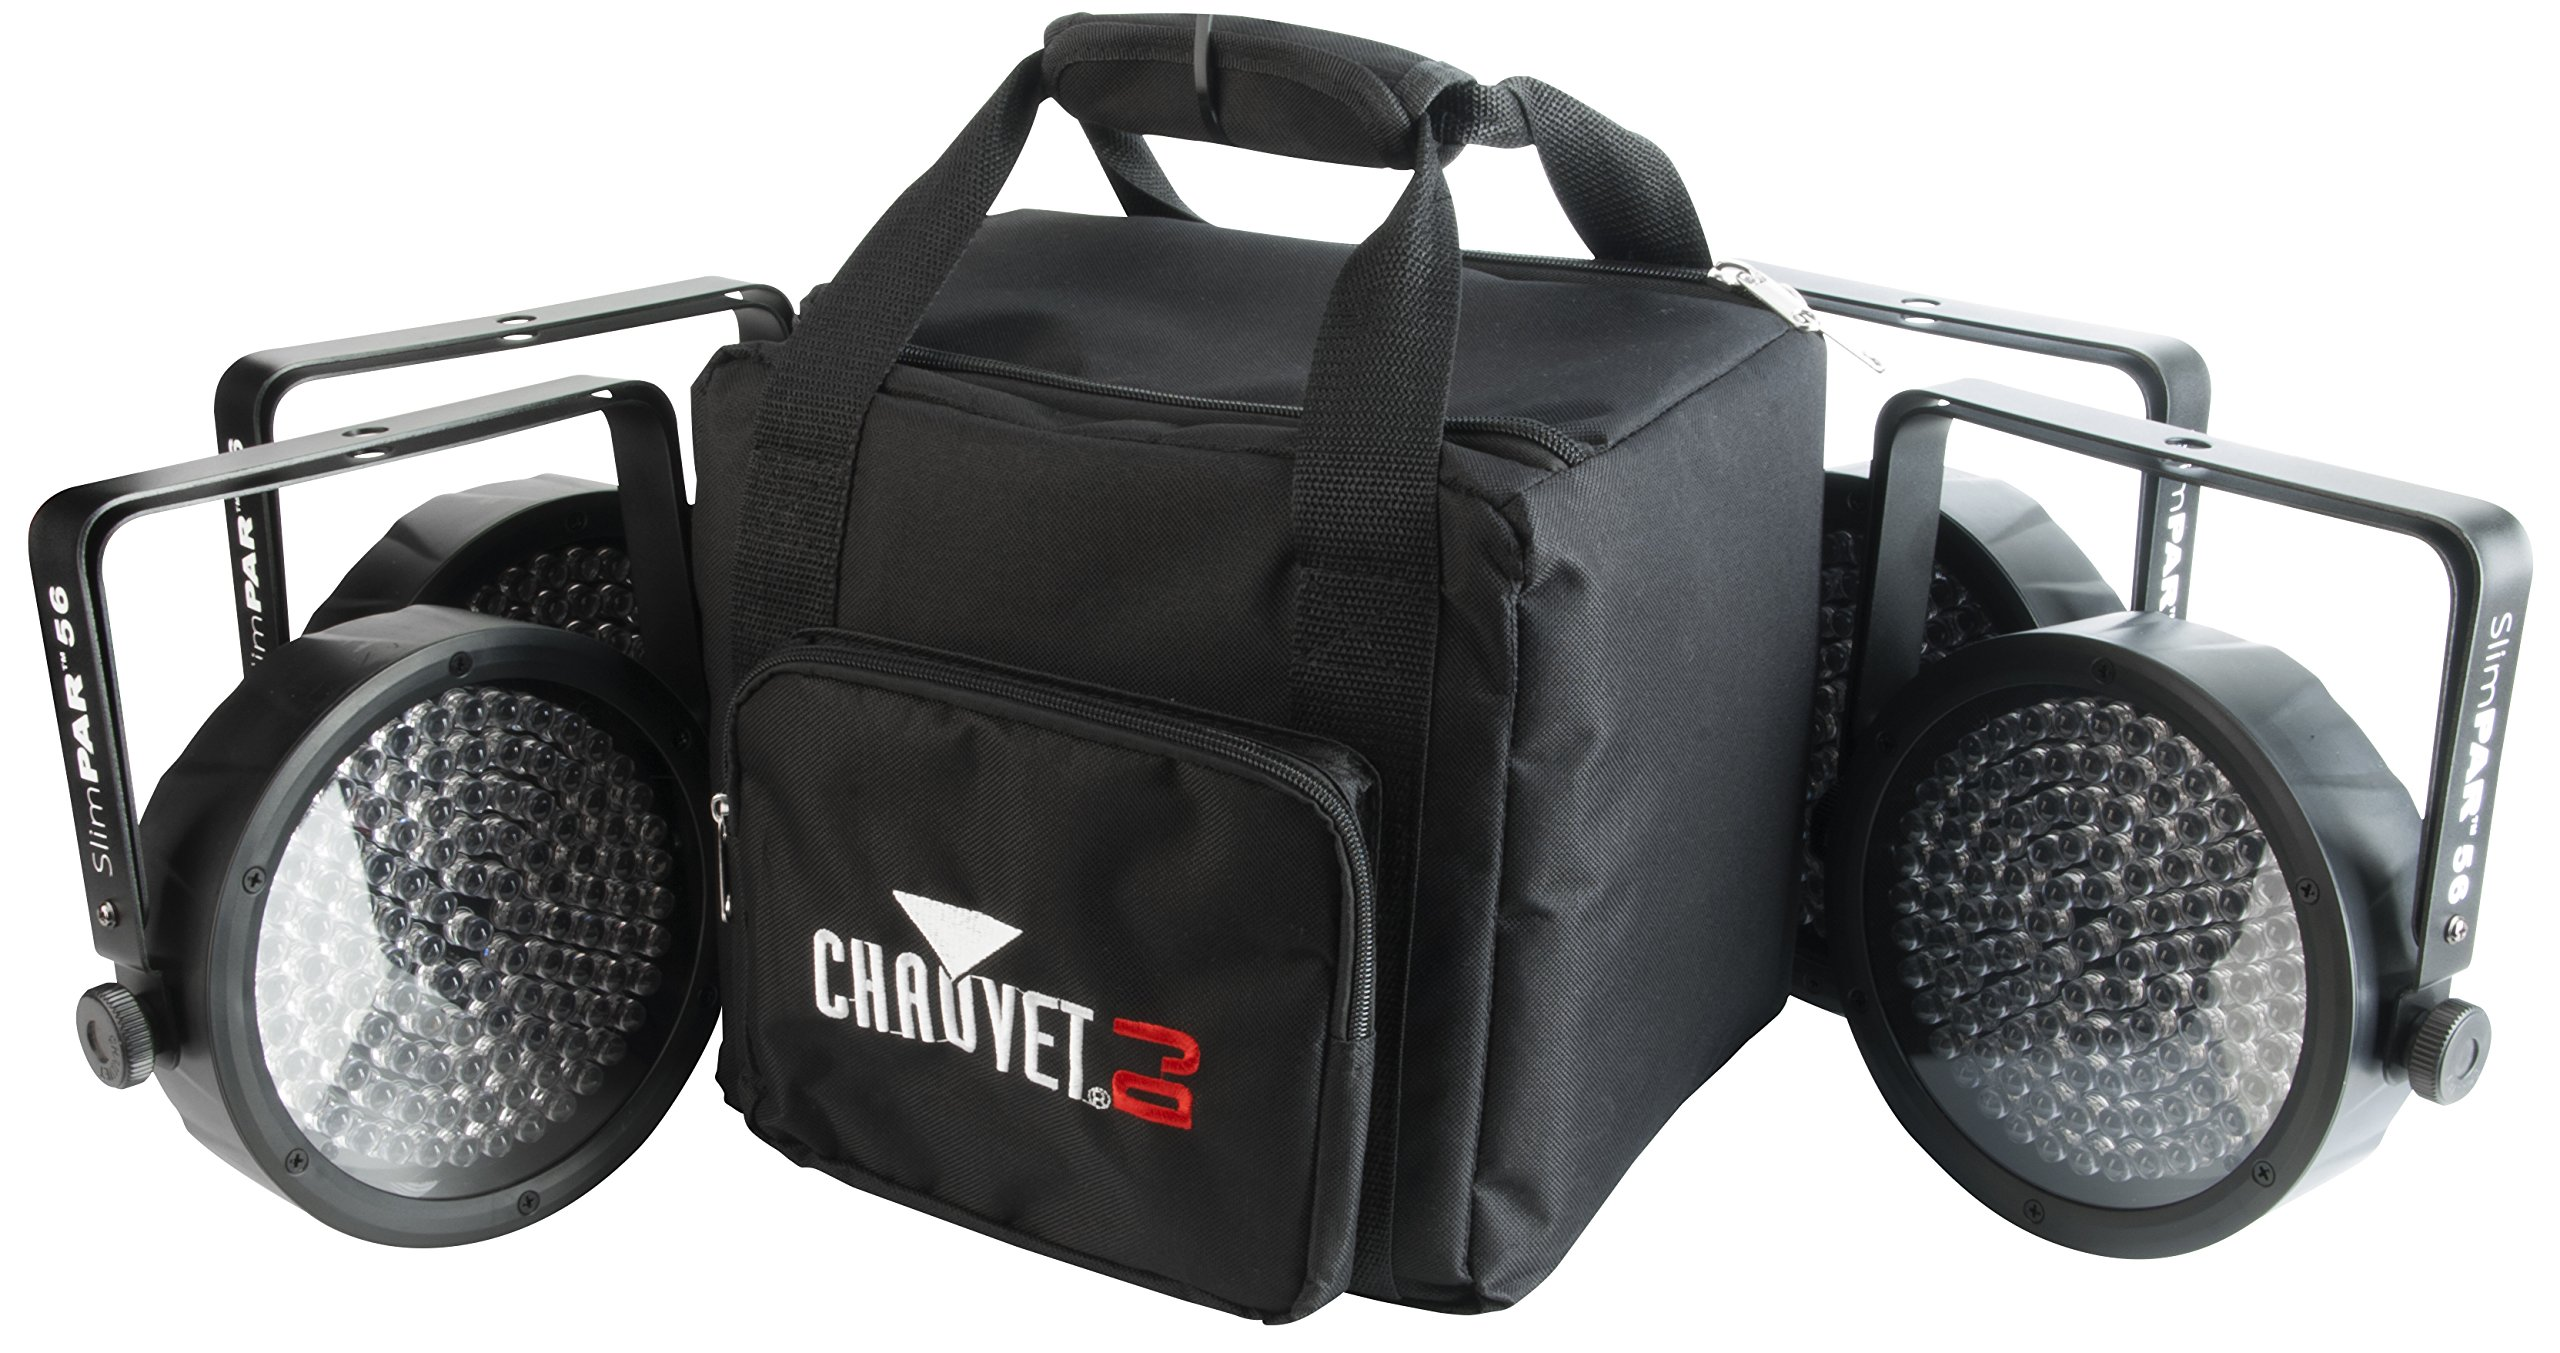 CHAUVET DJ SlimPACK 56 LT - 4 SlimPAR 56 Wash Lights & 3 DMX Cables w/CHS-SP4 VIP Gear Bag   LED Lighting by CHAUVET DJ